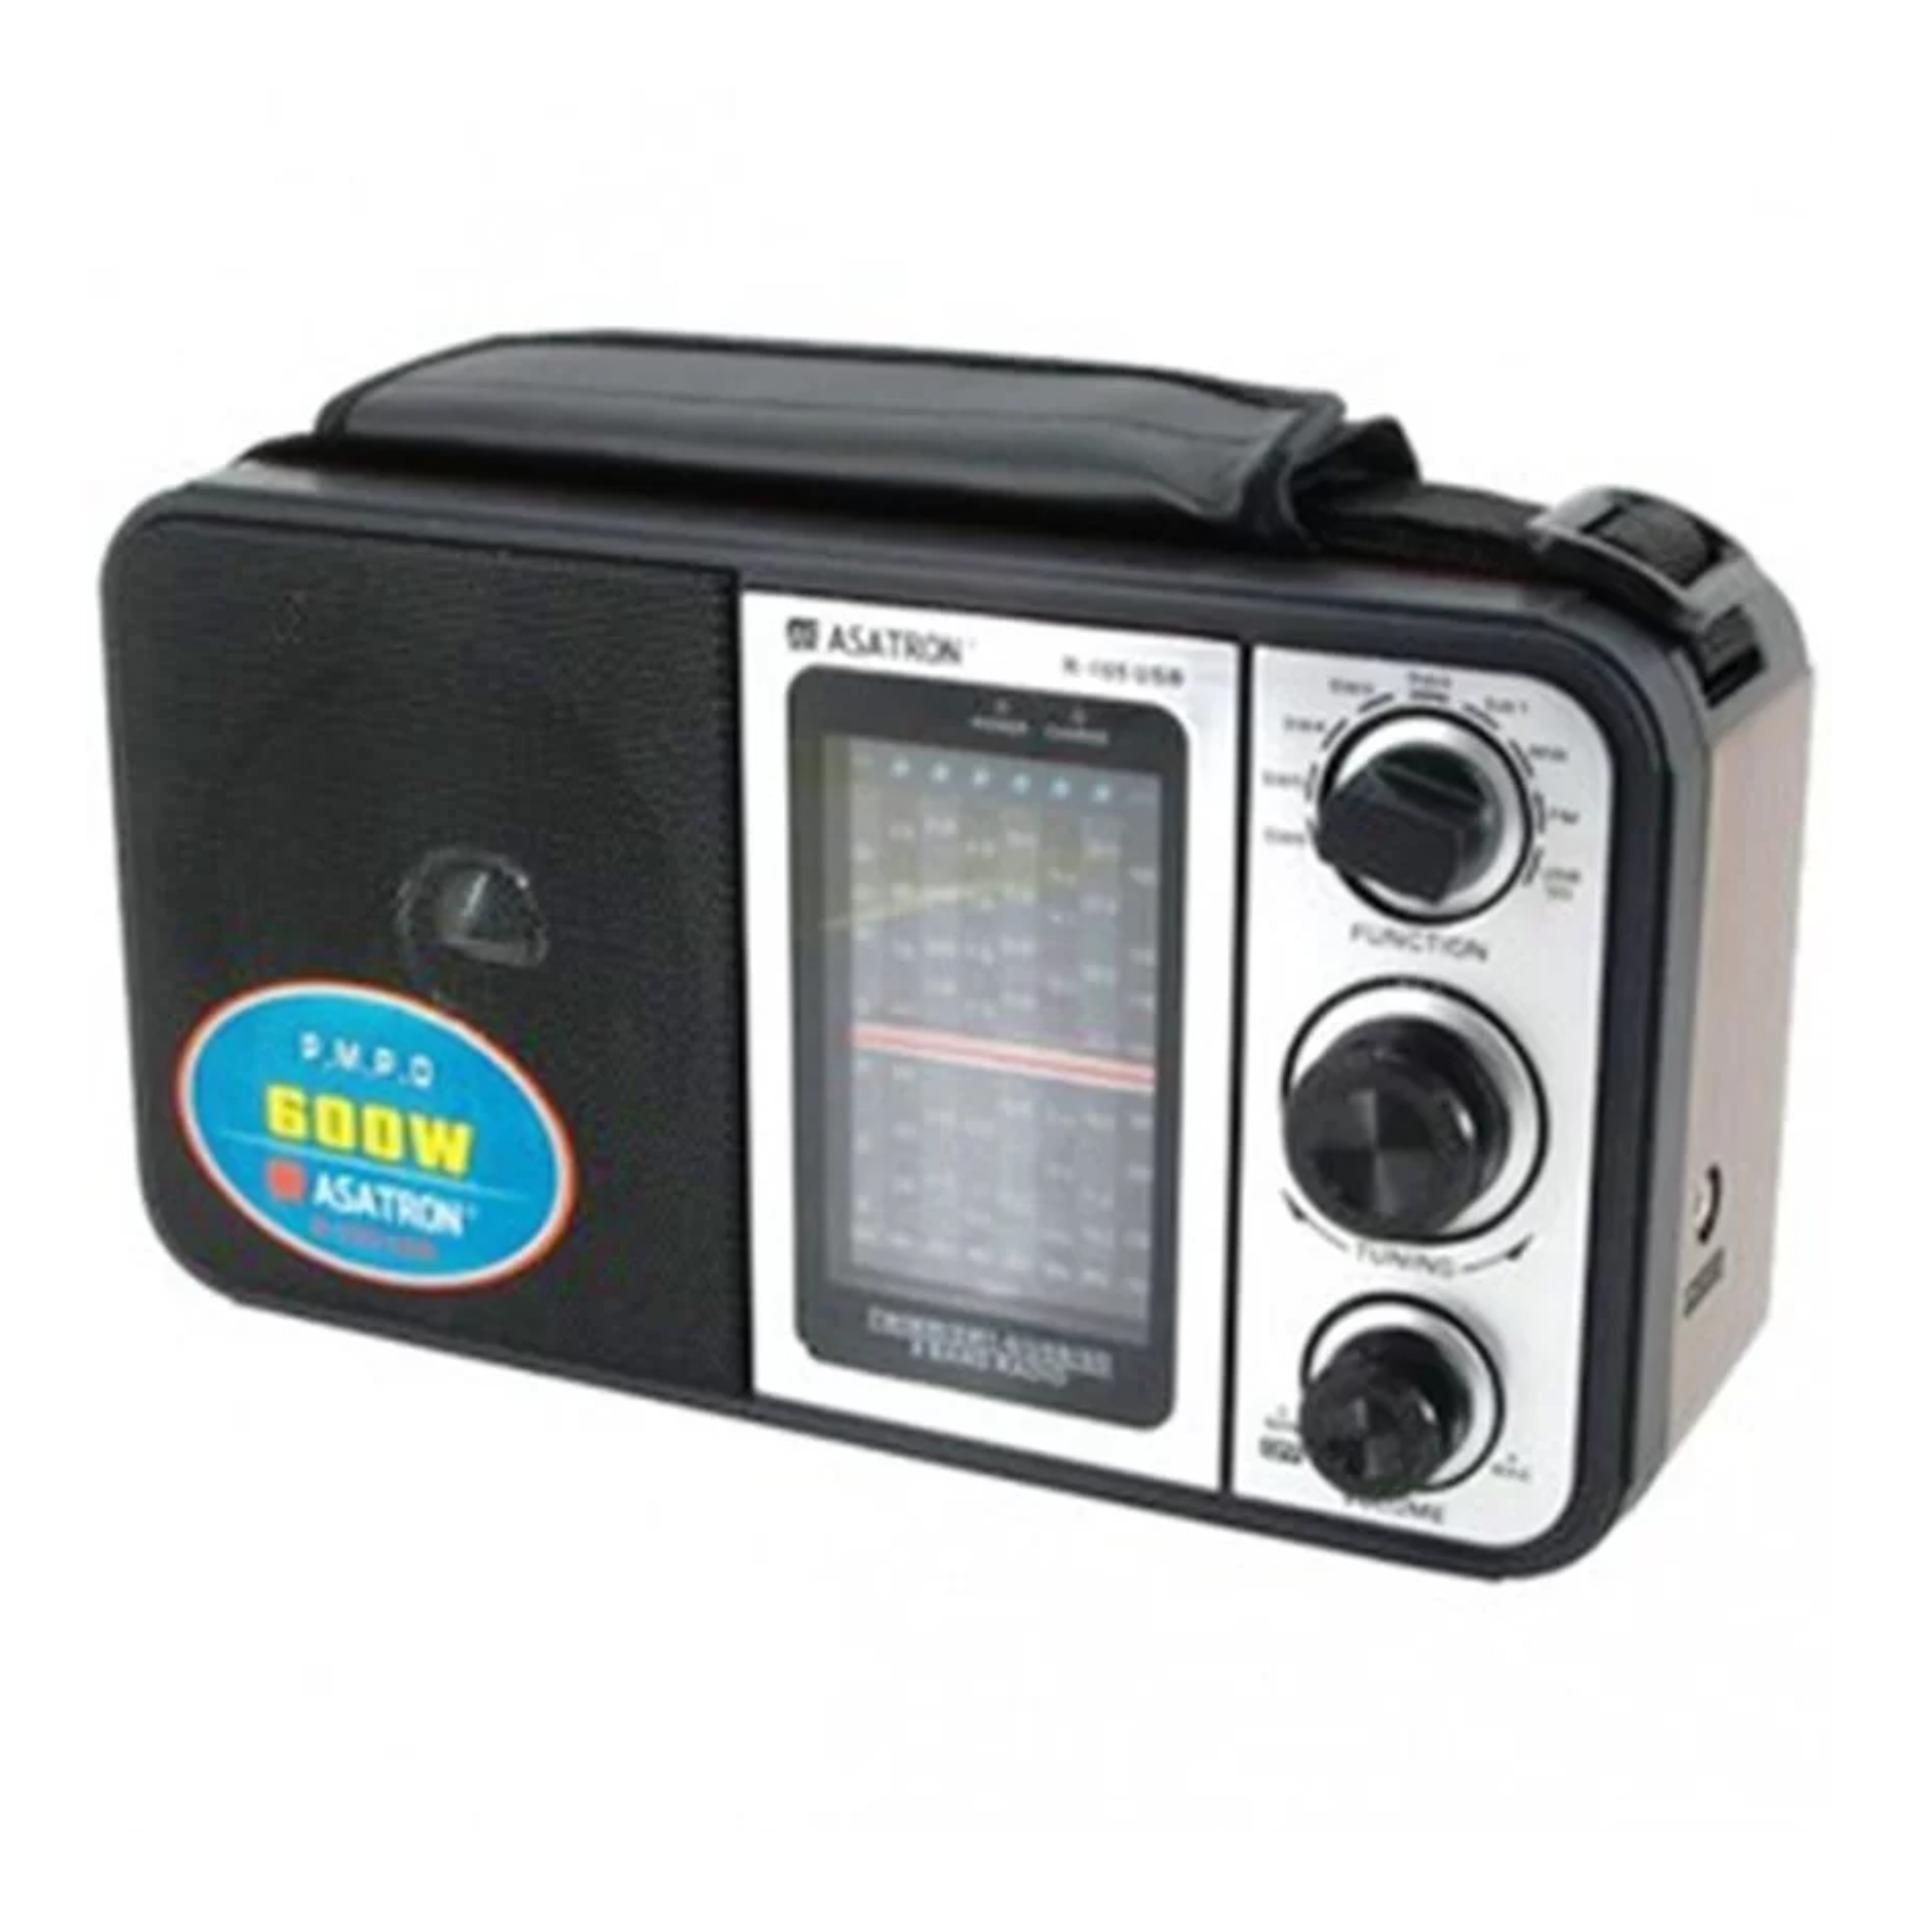 Asatron Radio R-105 USB - Hitam